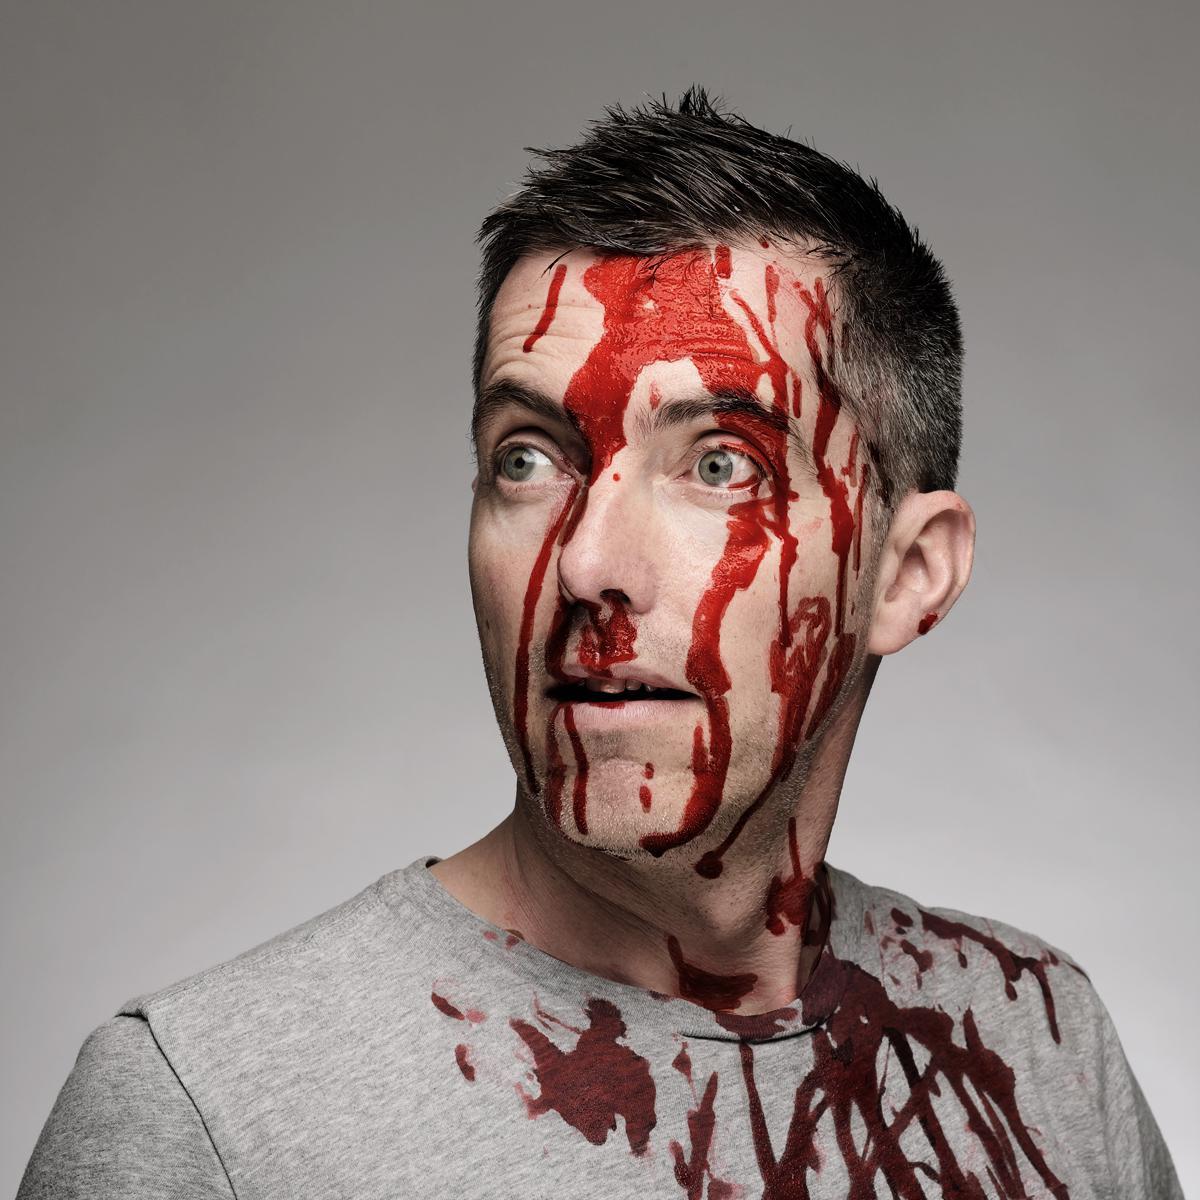 Creative Portrait of Alex Turner, Director at Fat Lemon Films by Julian Hanford